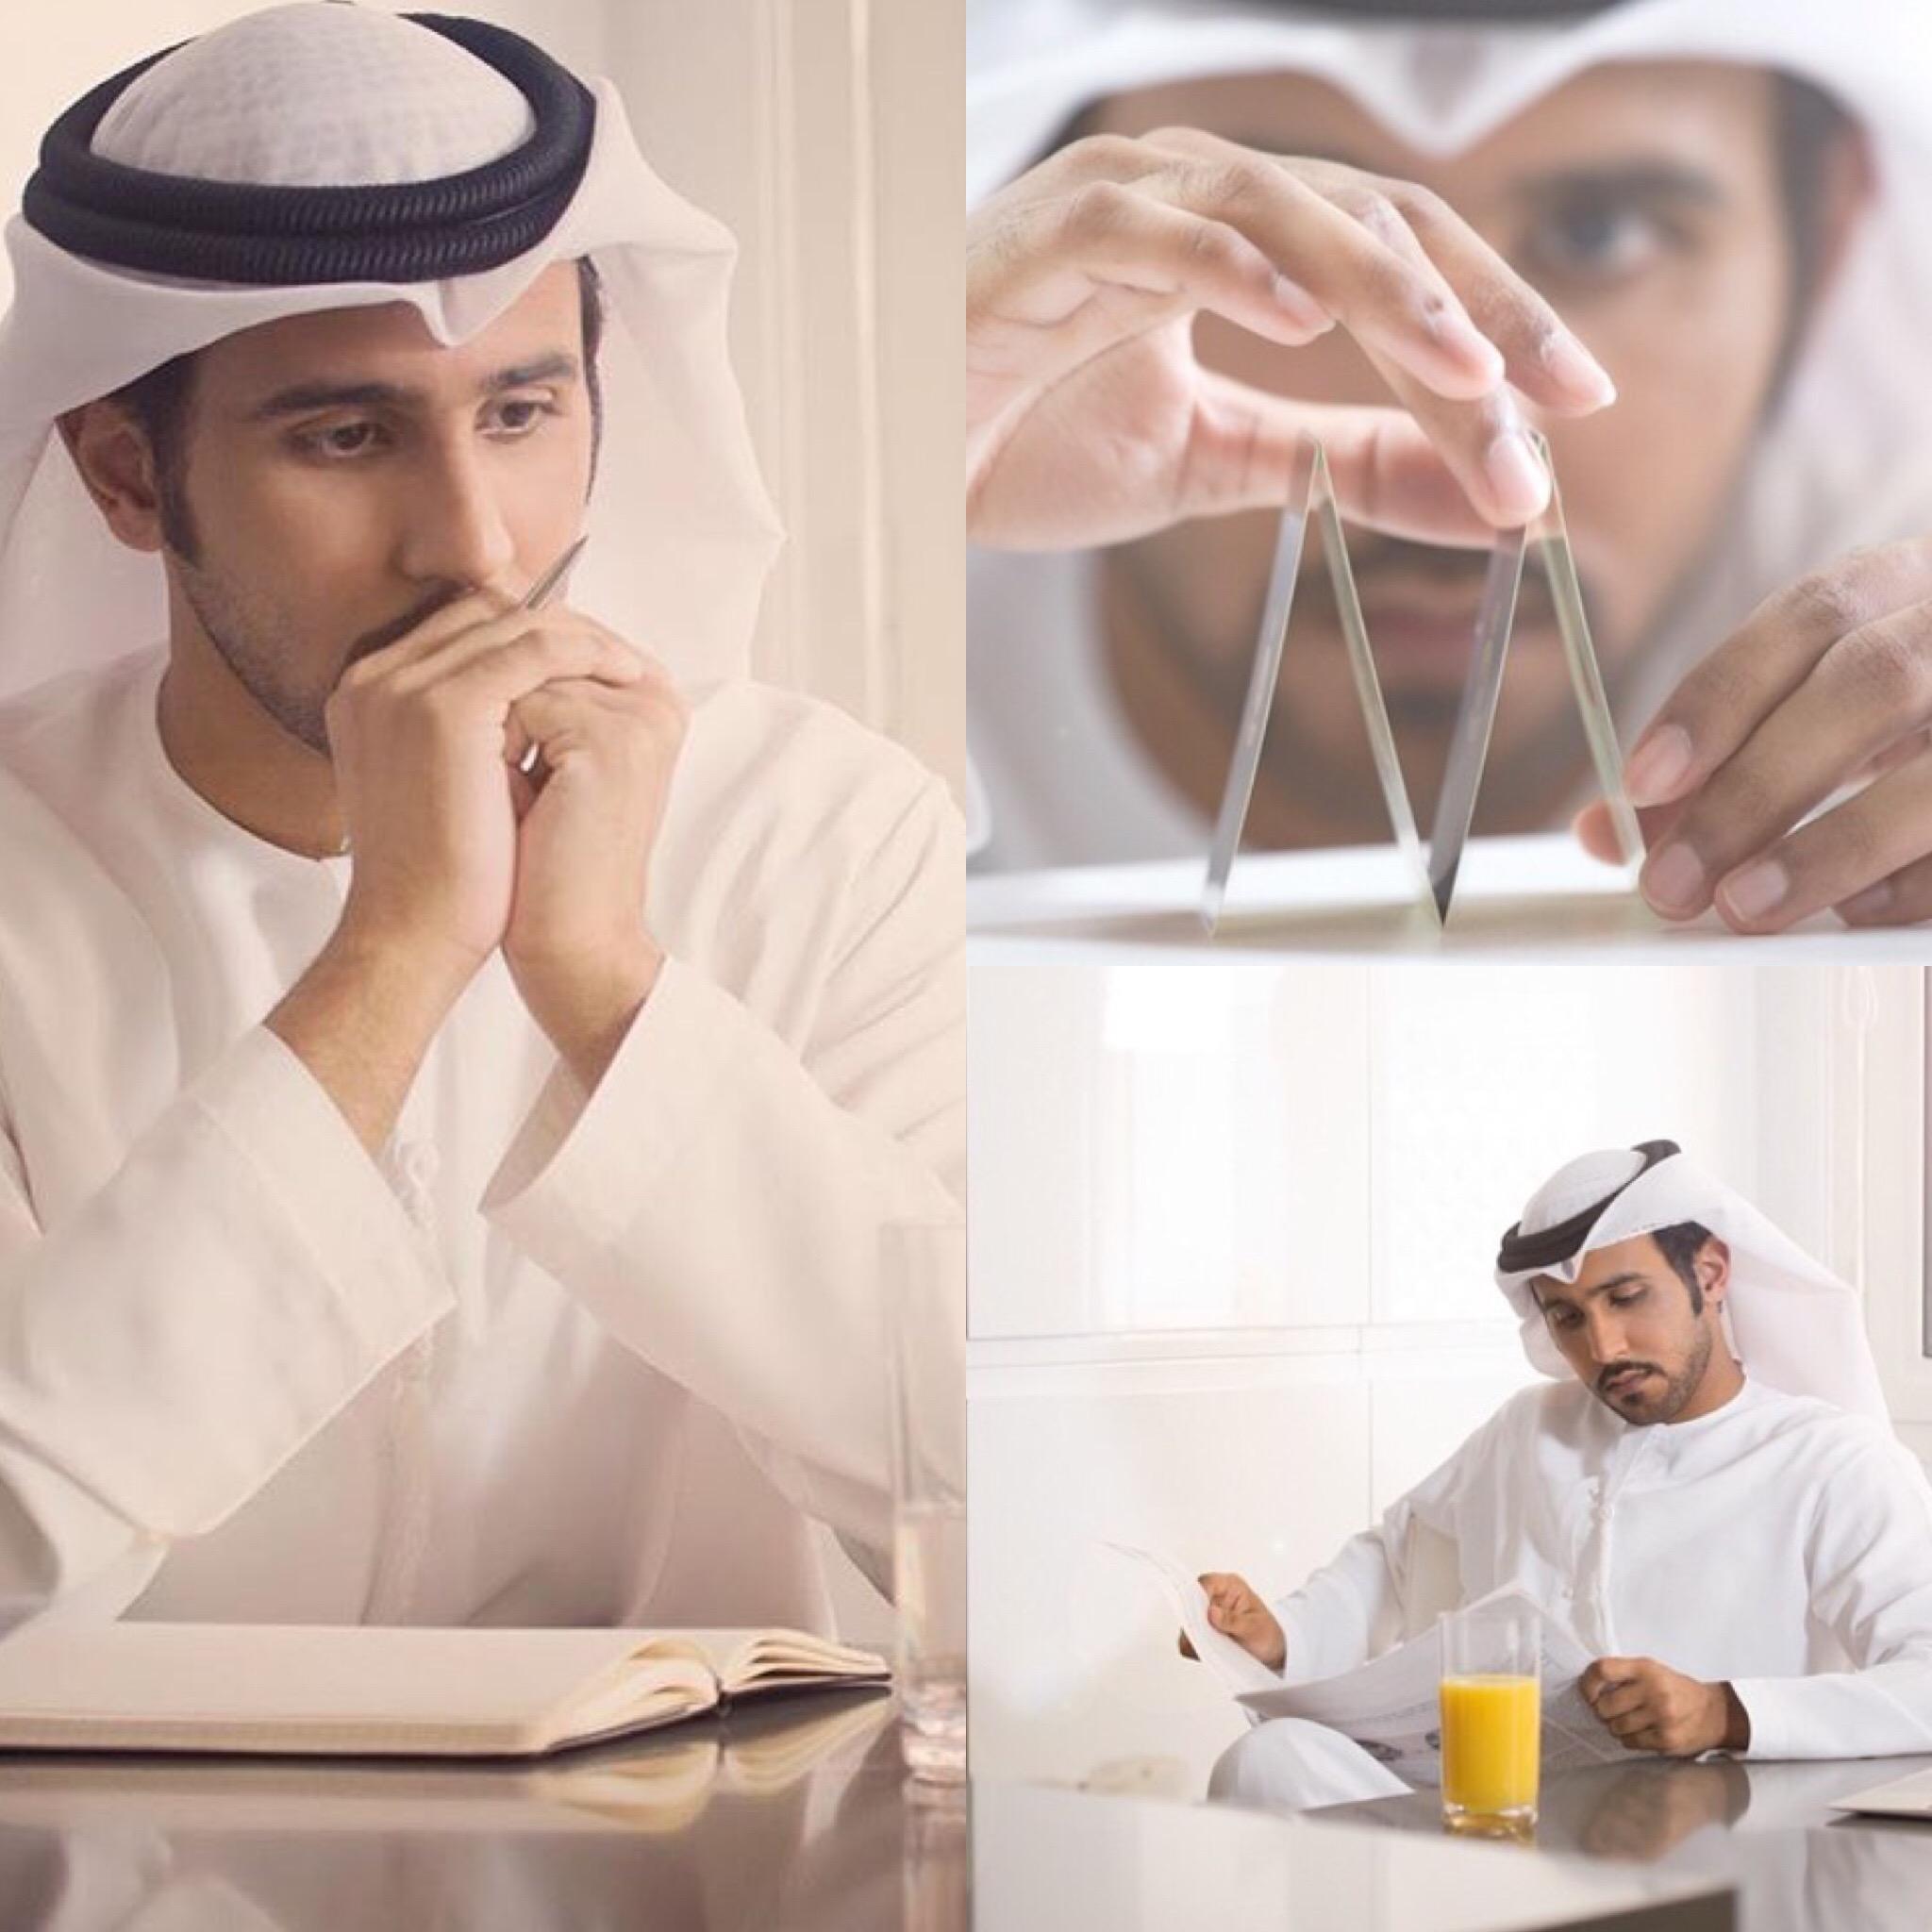 Bader Mohammed | 中东(阿联酋七大酋长国)合伙人   阿联酋AUE大学学士、迪拜明星  获阿联酋皇国王颁发荣誉青年奖  为阿联酋各国代言韩国三星、阿联酋银行等国际品牌